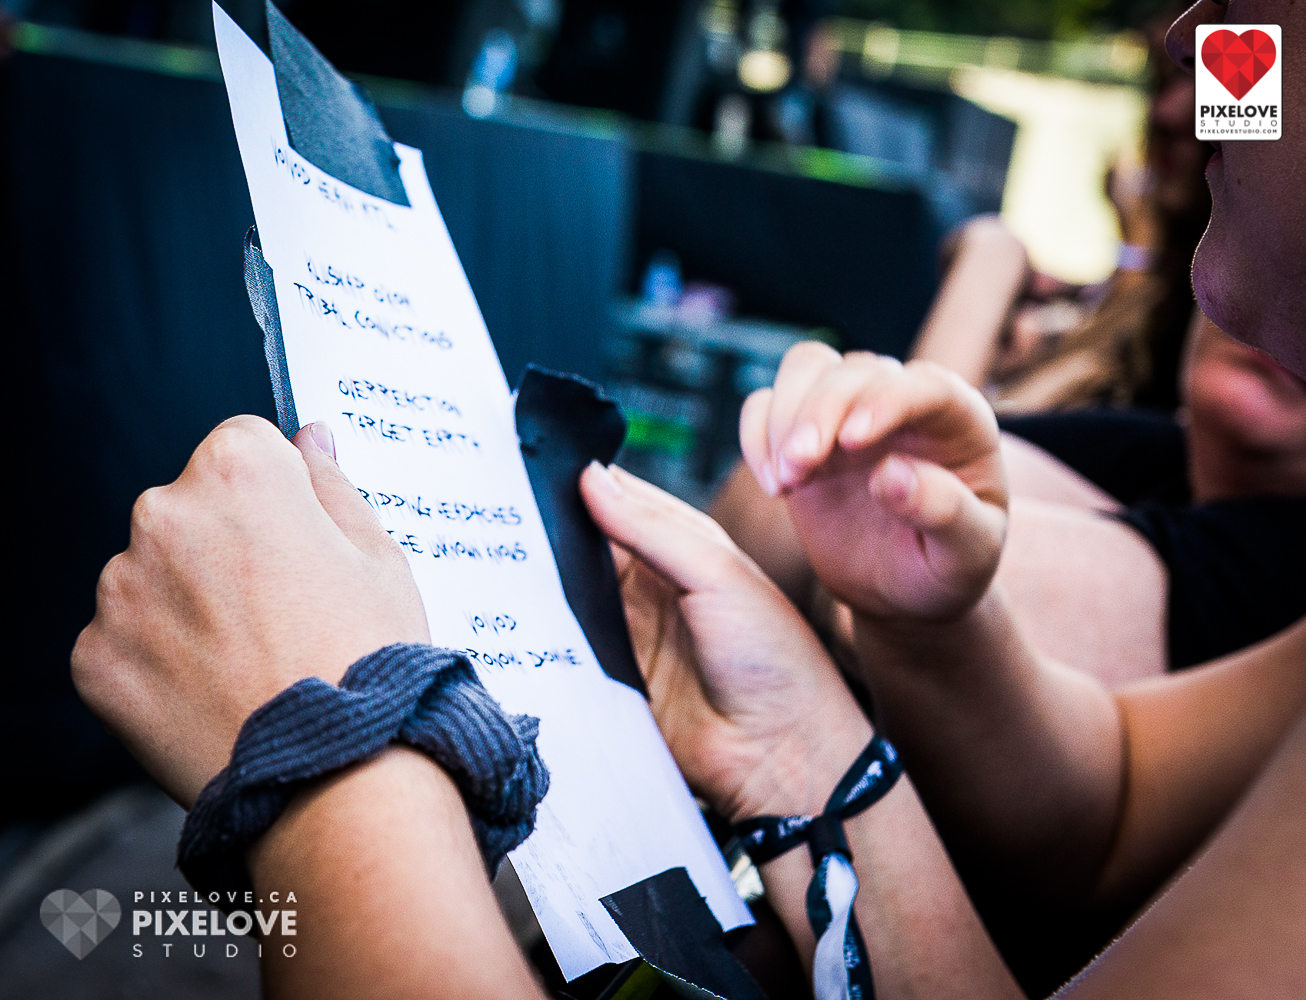 Heavy Montreal 2014 heavy metal music festival at Parc Jean-Drapeau.